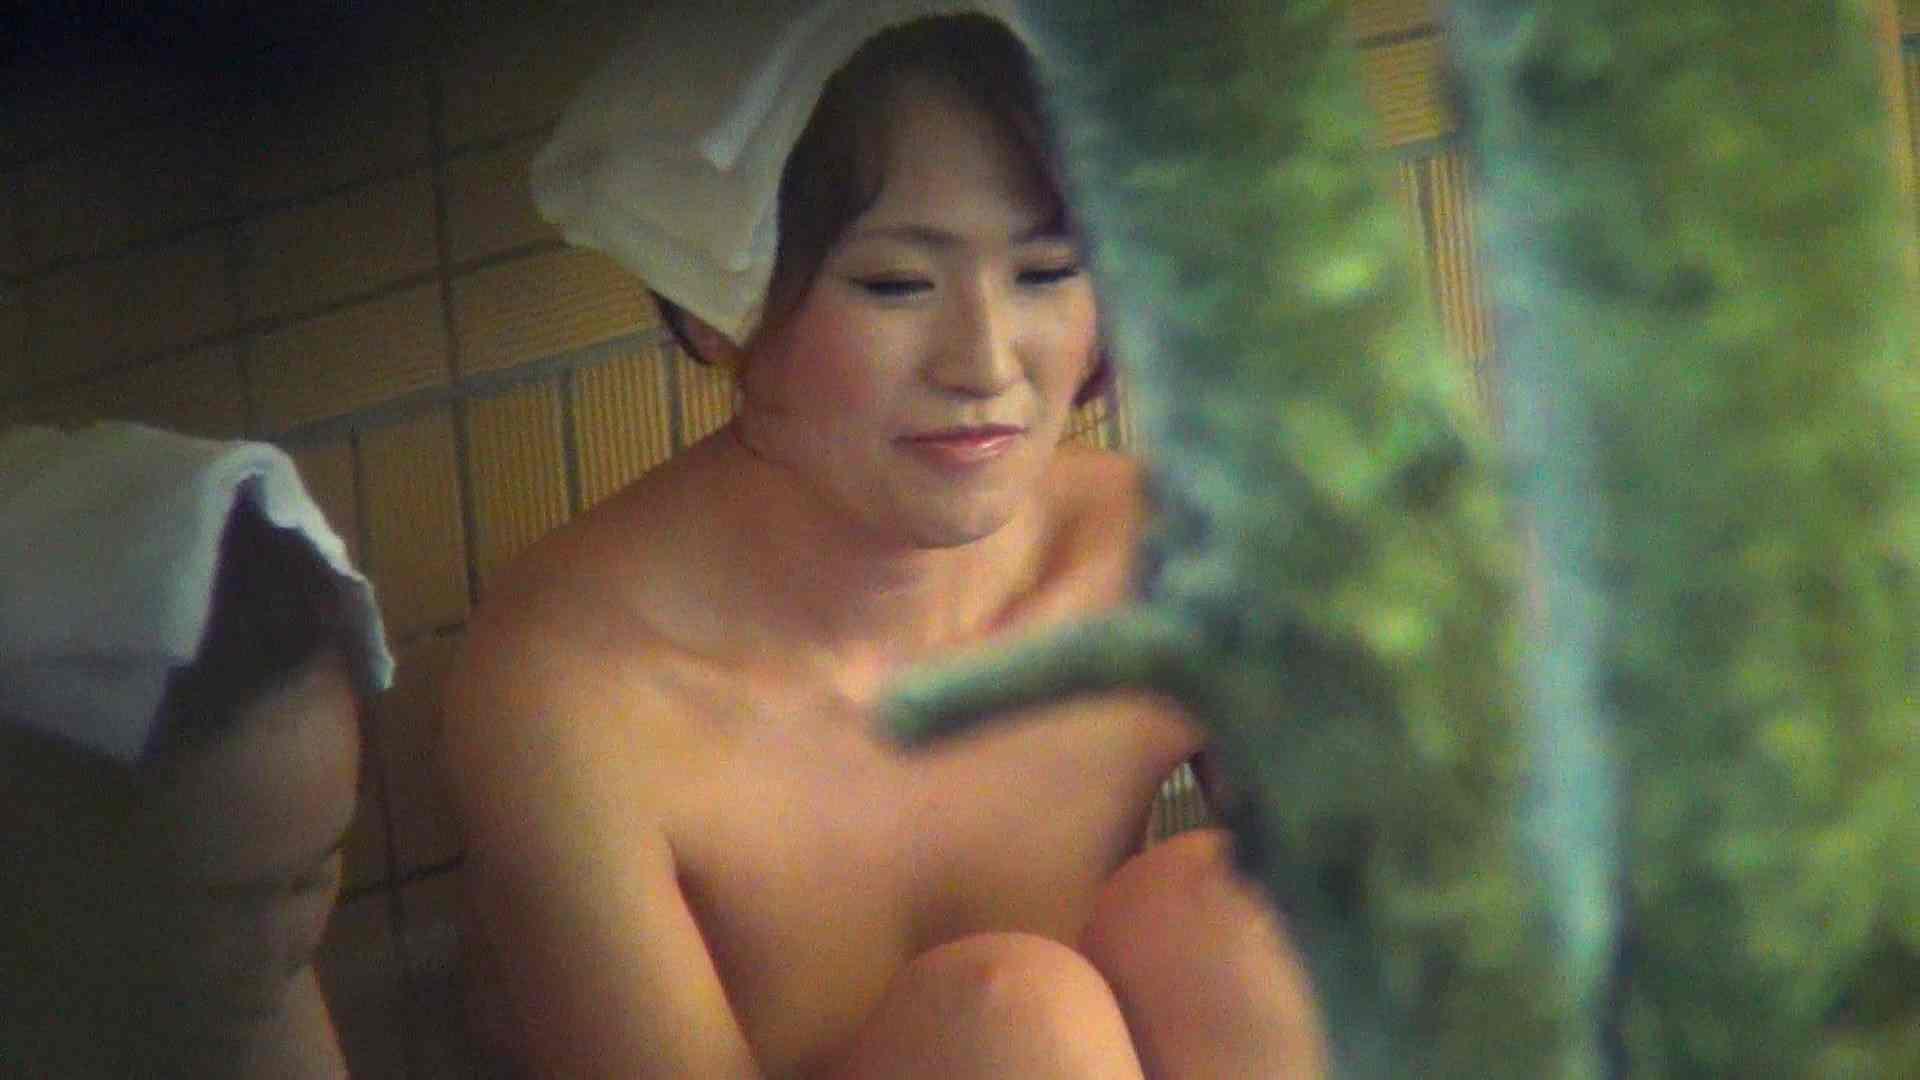 Aquaな露天風呂Vol.272 0   0  75連発 7